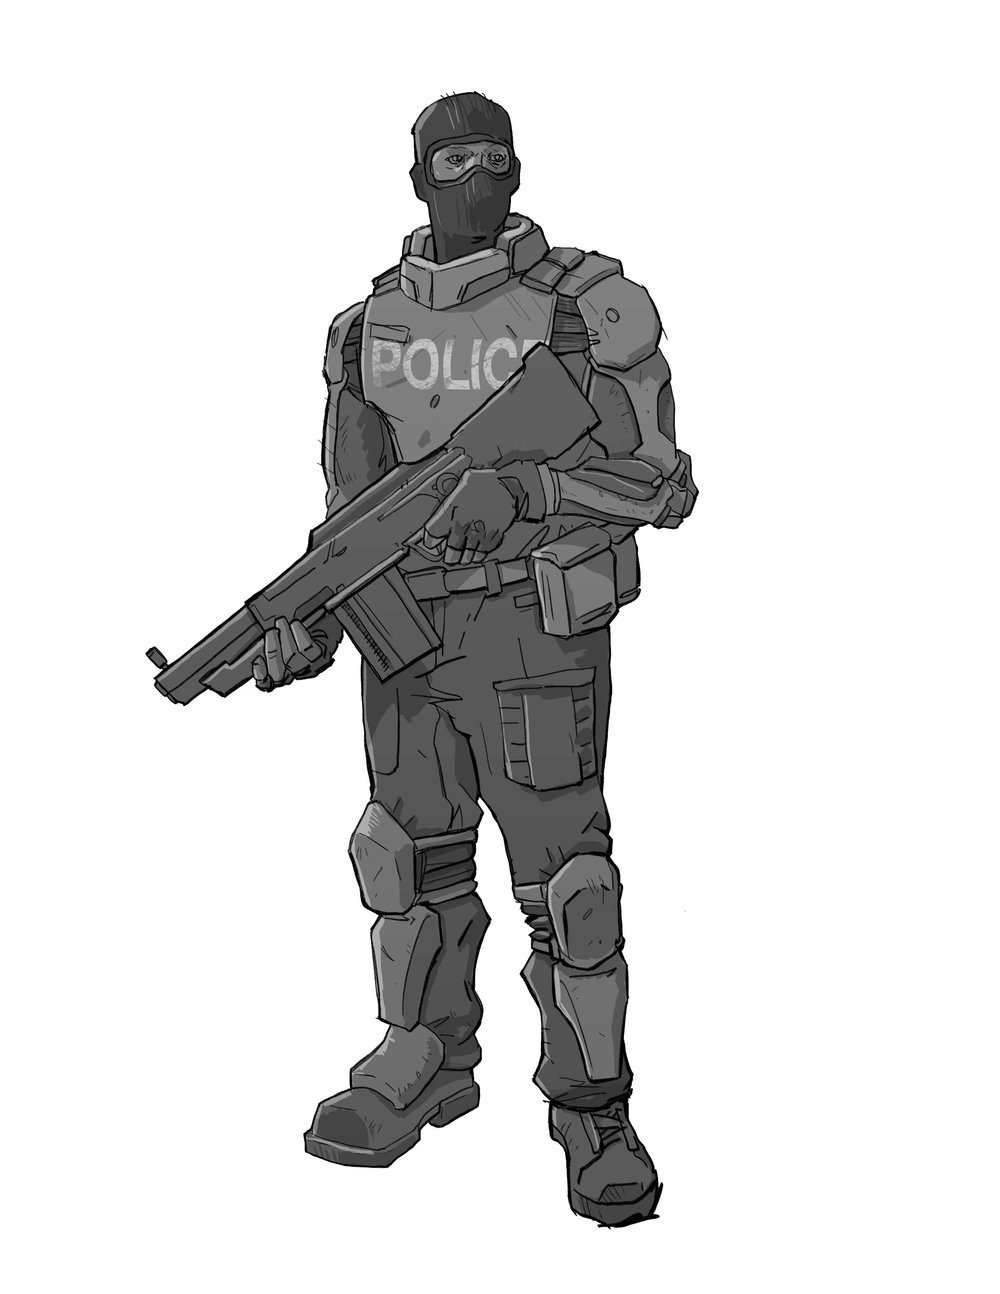 Police_Soldier.jpg